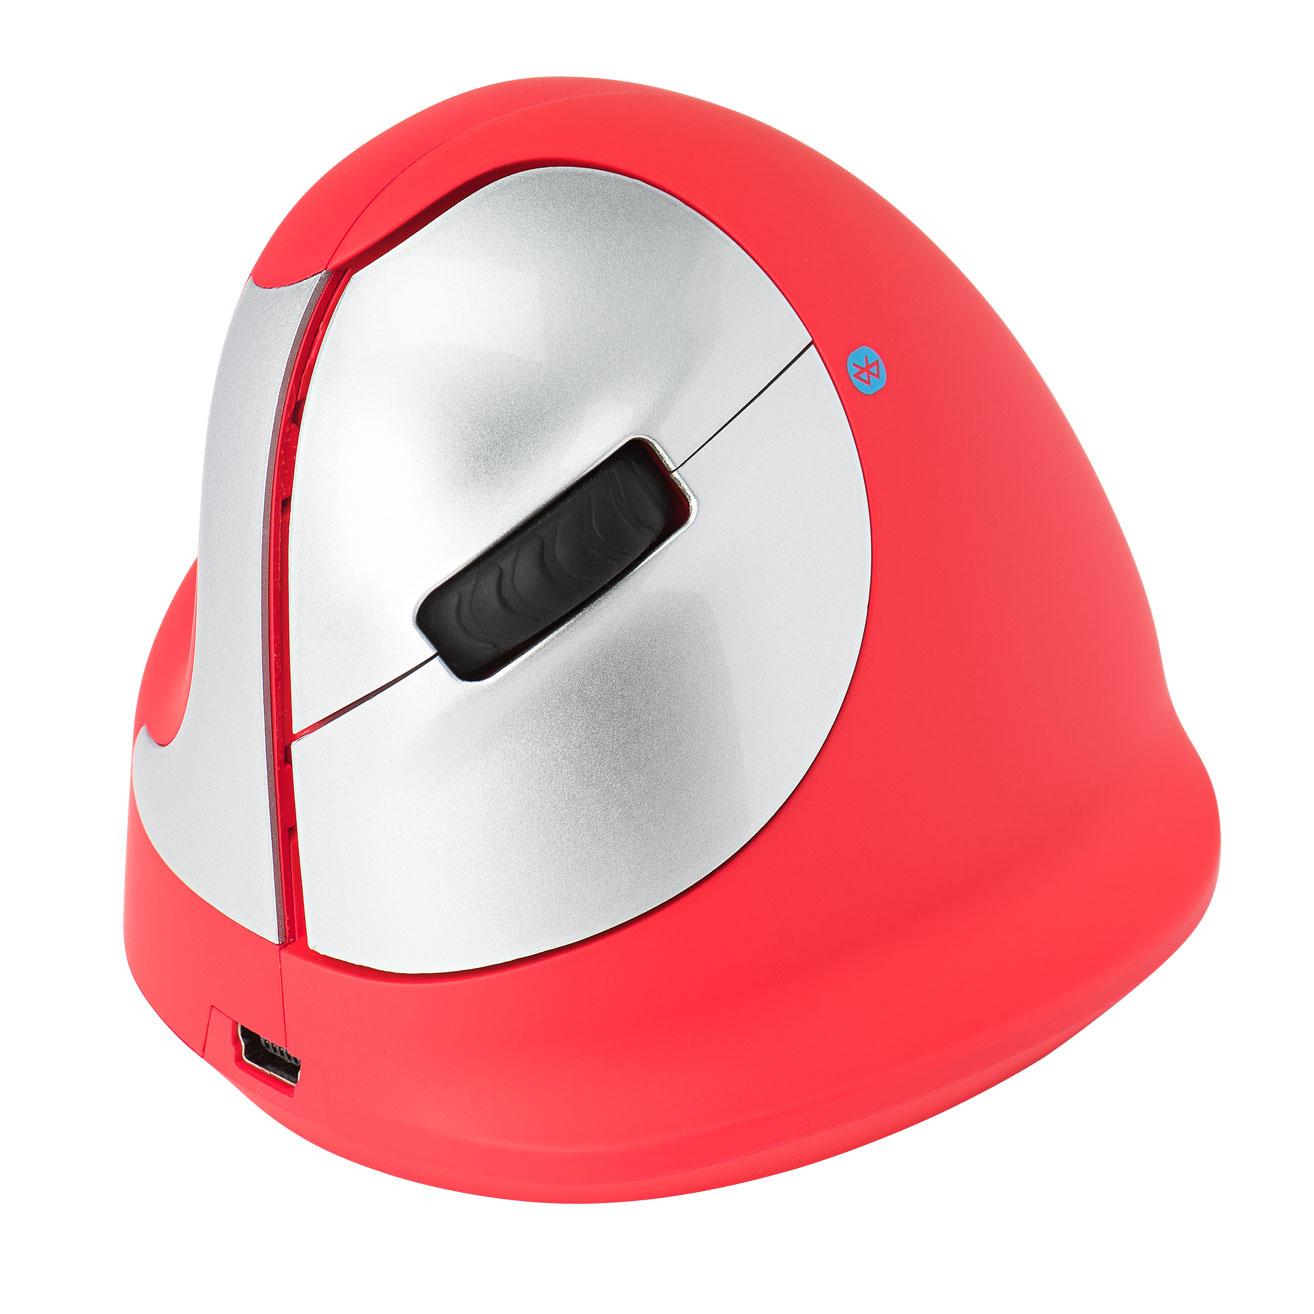 R-Go Tools R-Go HE Sport Ergonomische muis, Medium (Handlengte 165-185mm), Linkshandig, Bluetooth, Rood